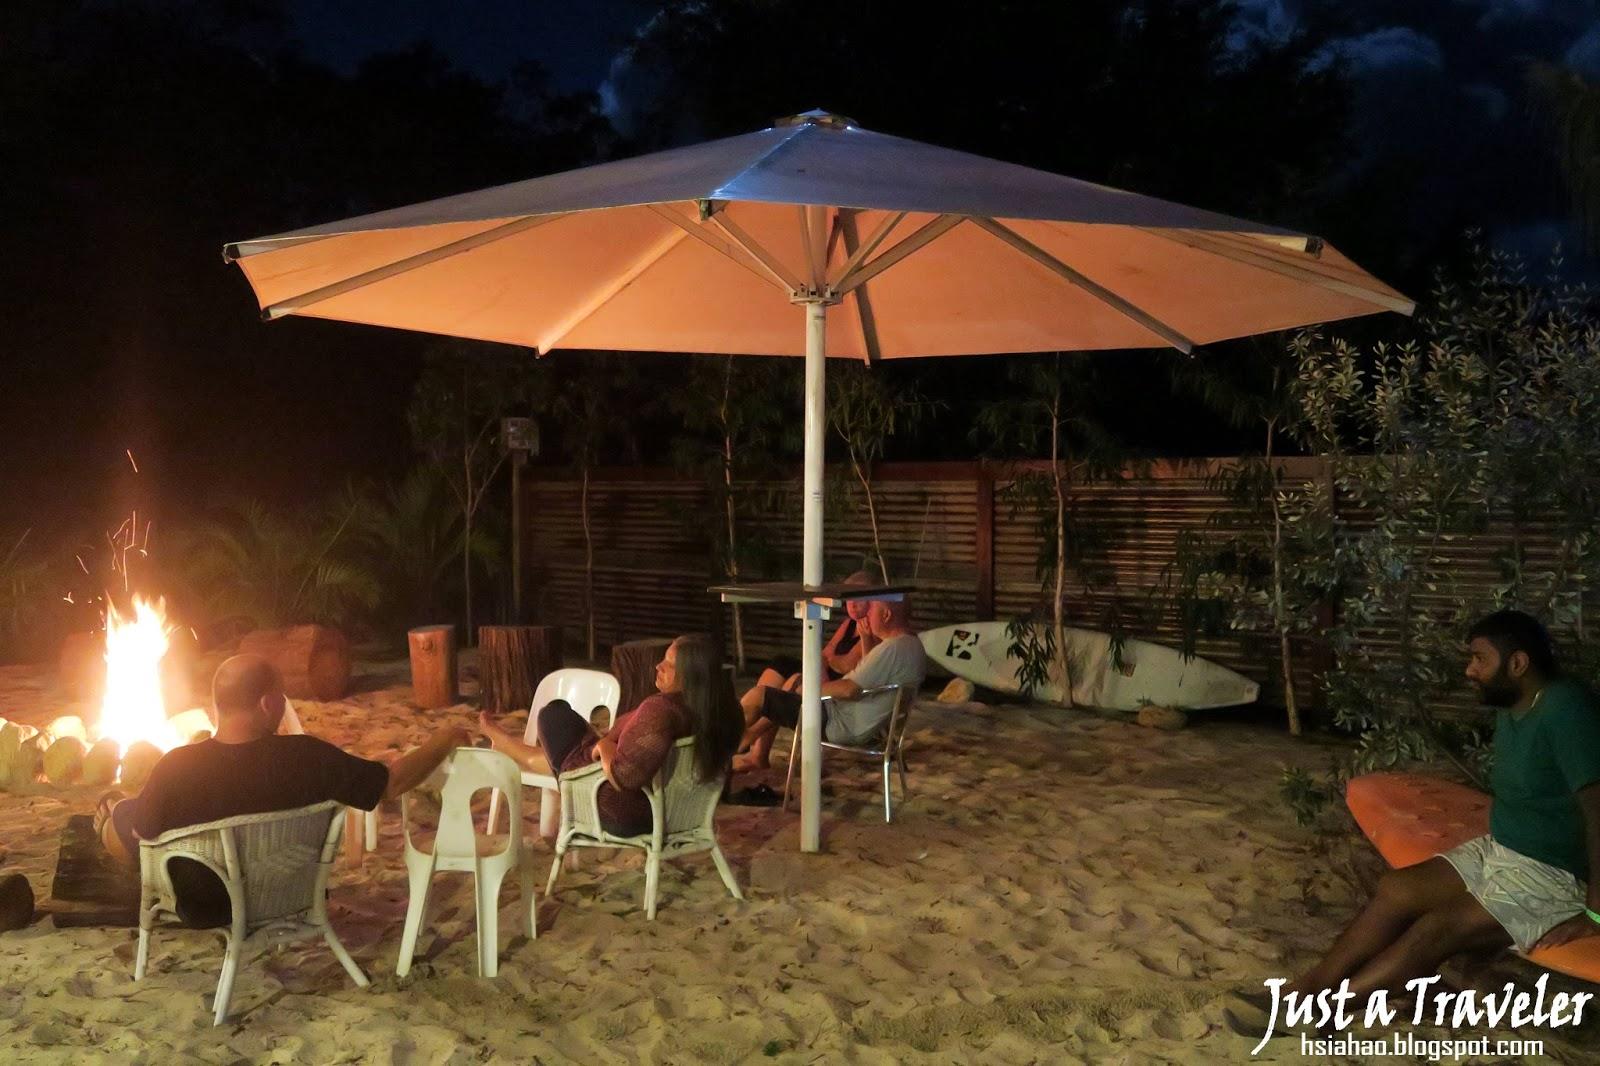 布里斯本-摩頓島-景點-交通-住宿-推薦-旅遊-自由行-澳洲-Brisbane-Moreton-Island-Tourist-Attraction-Travel-Australia